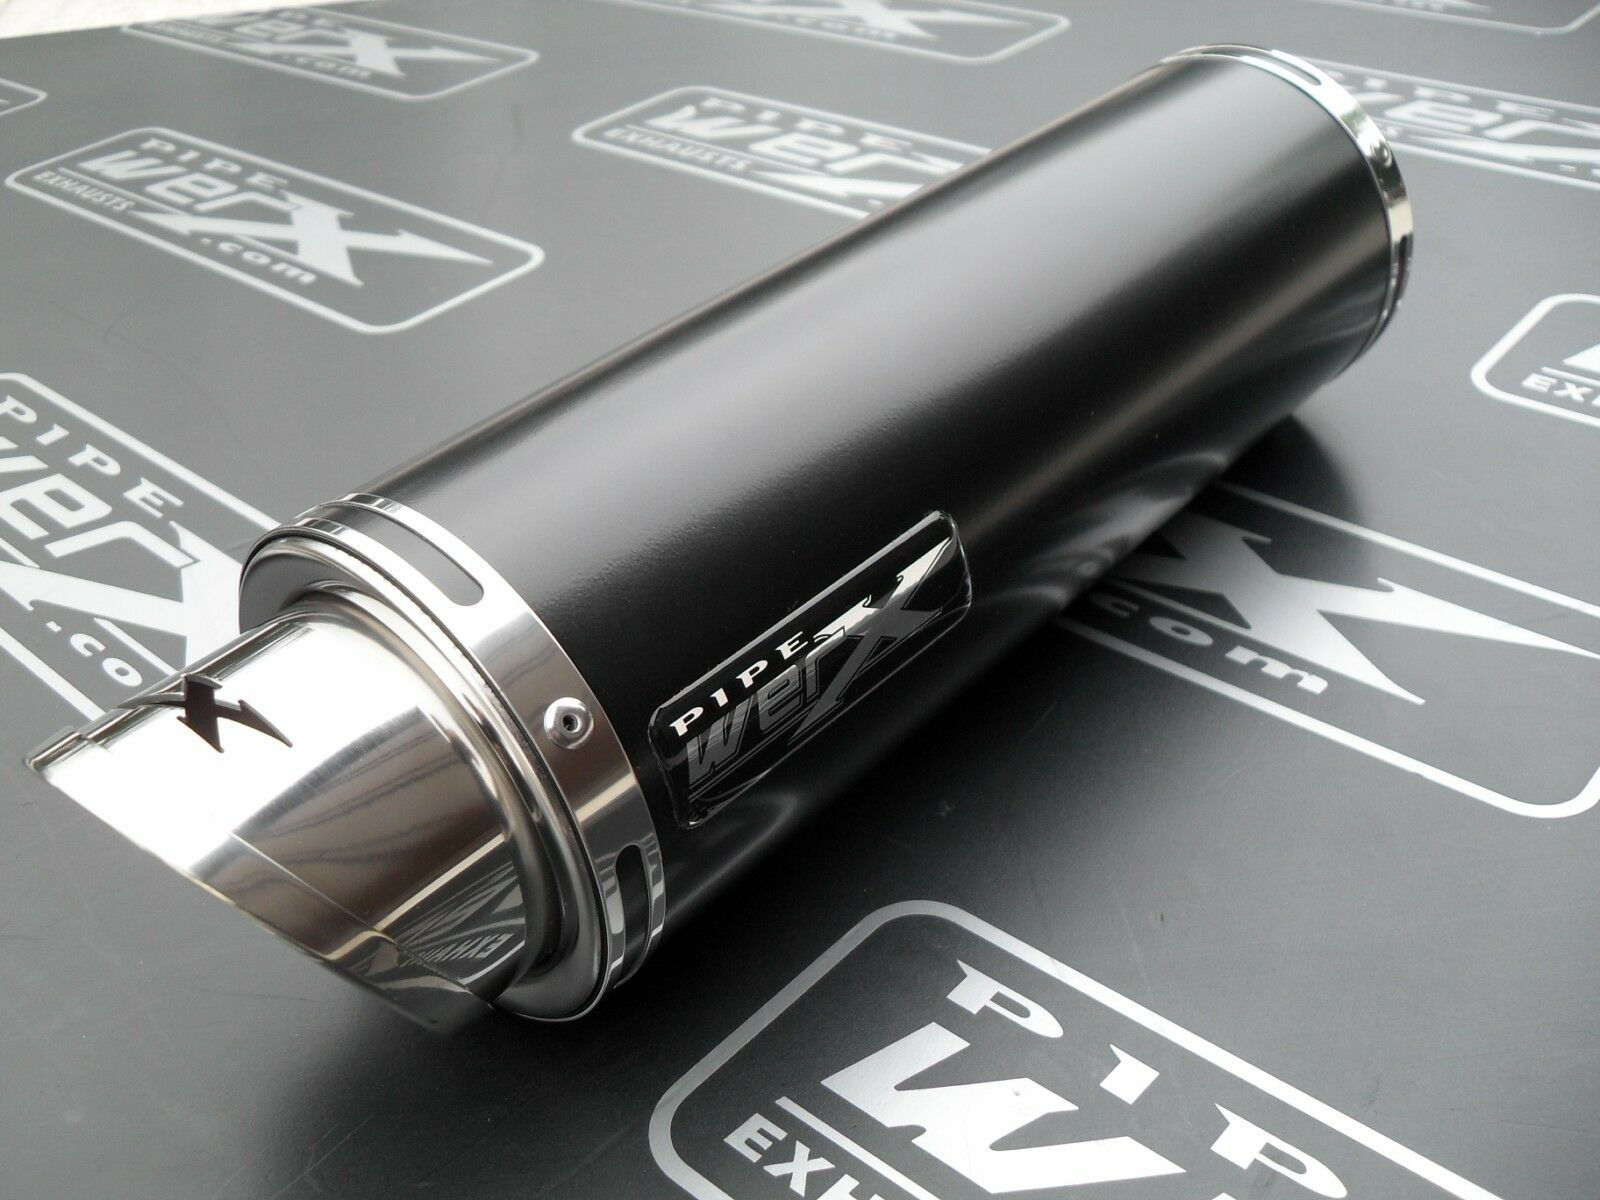 research.unir.net KTM 1290 Superduke 2014 Brushed Stainless Steel ...